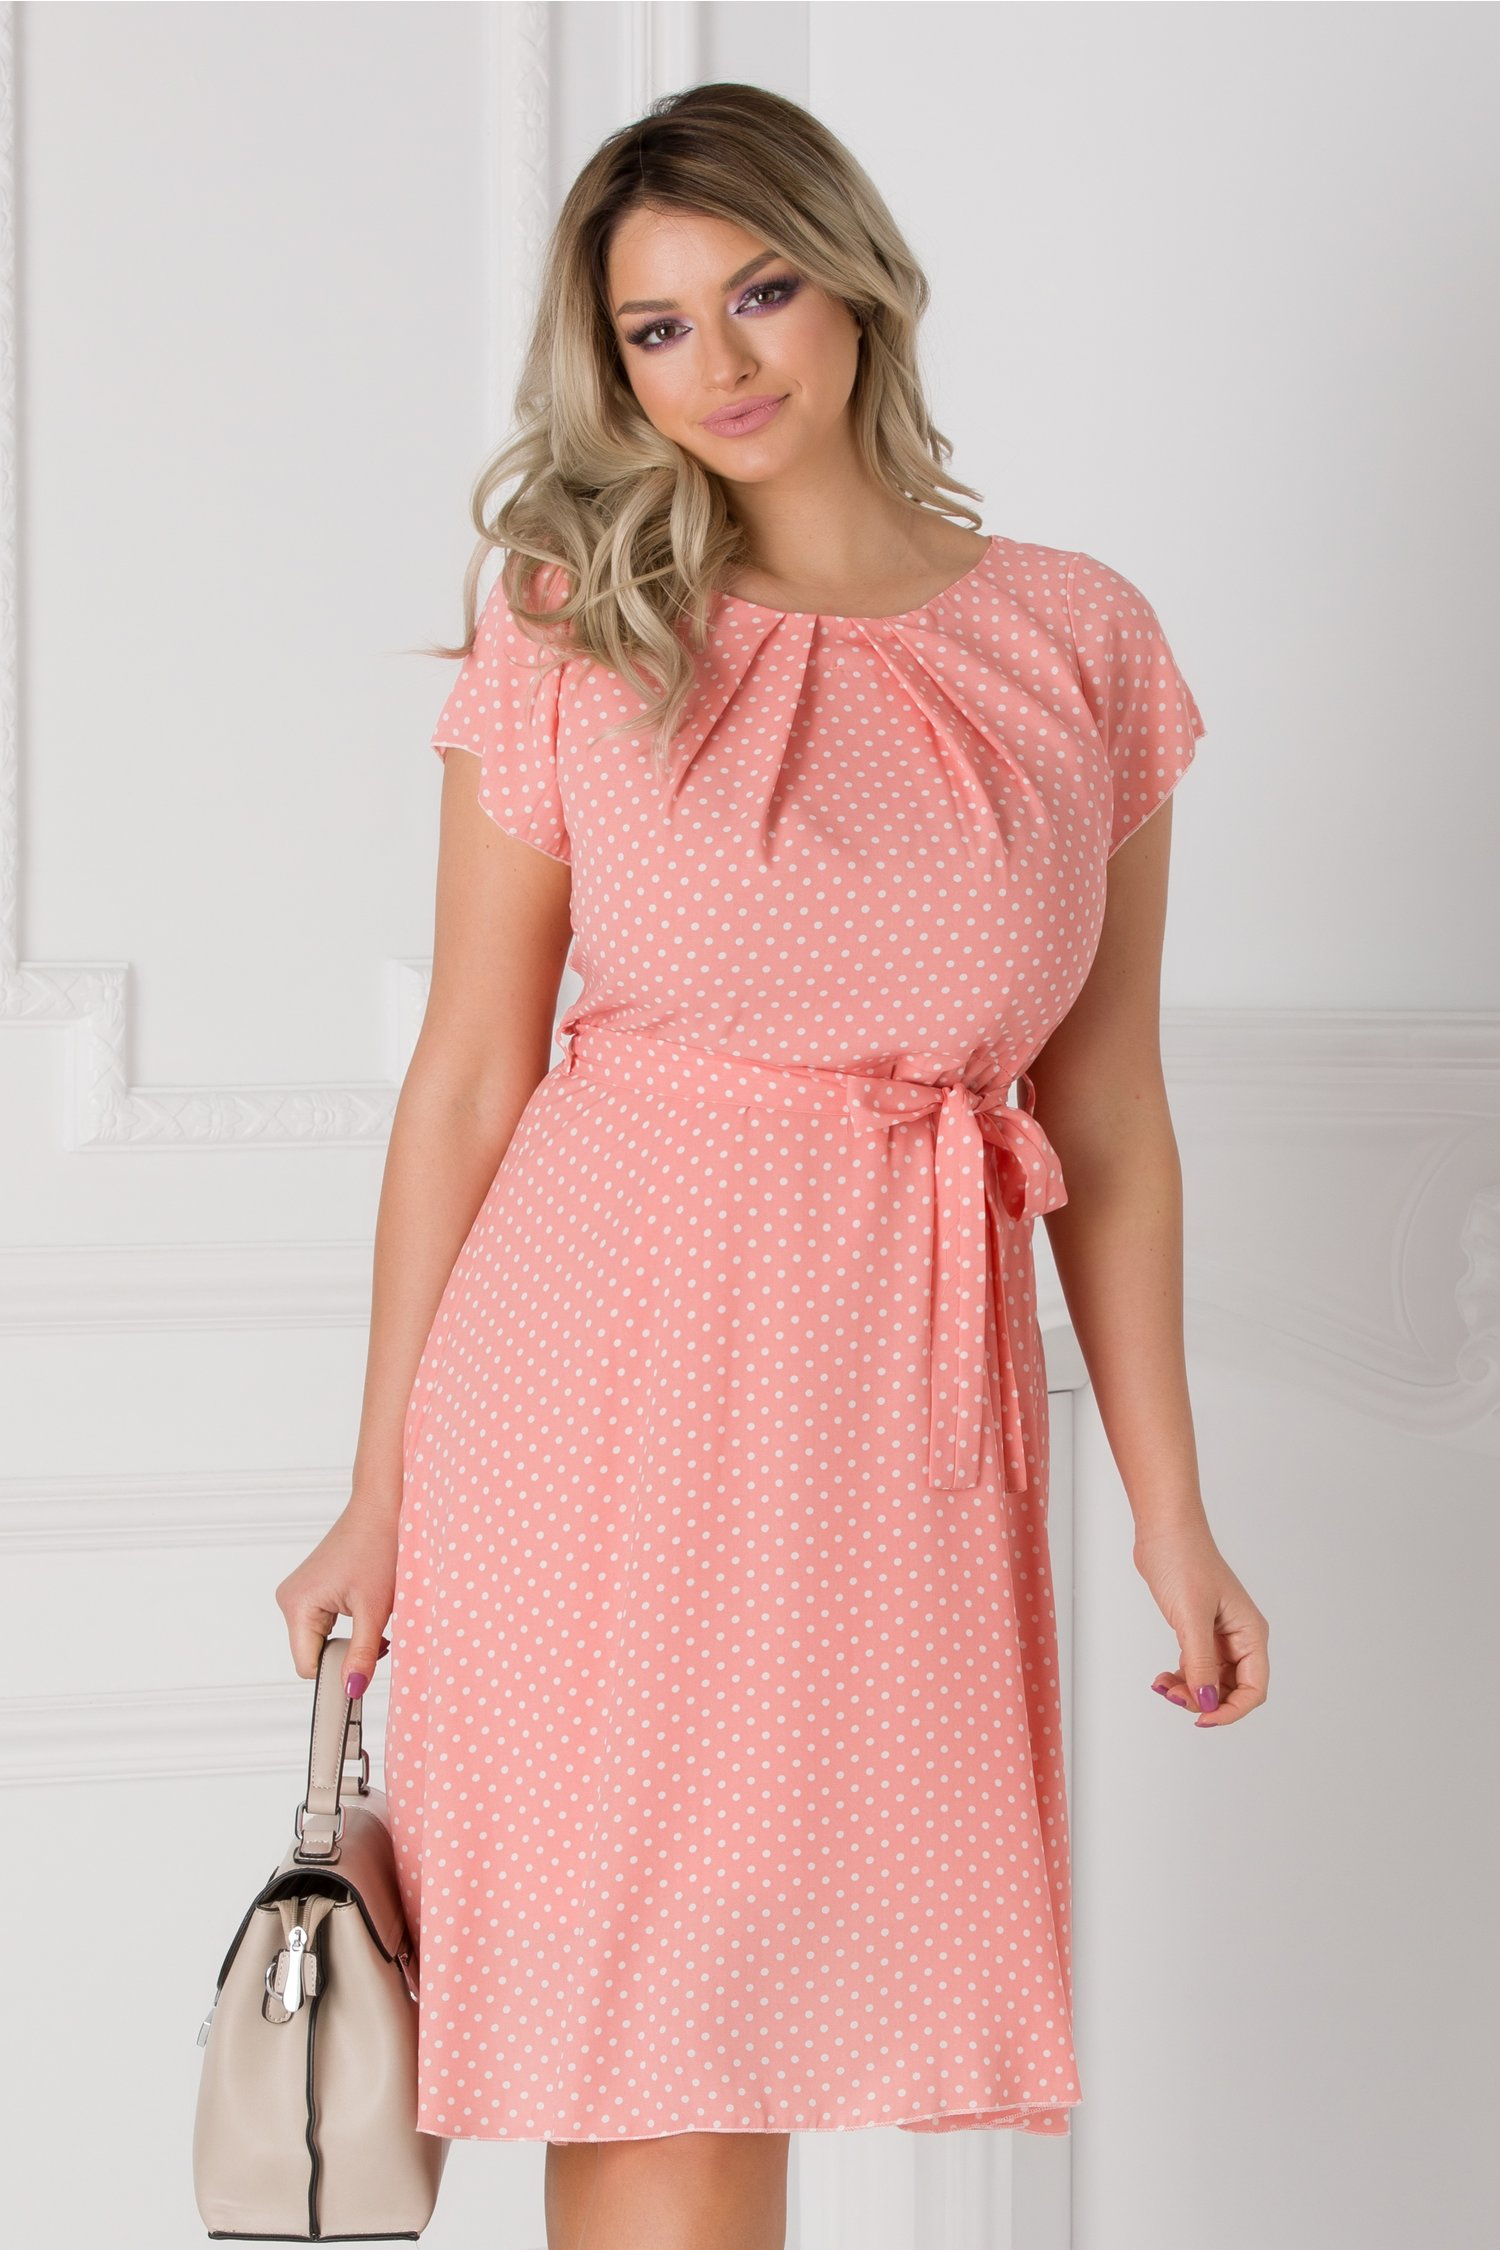 Rochie Missa de vara roz cu buline albe